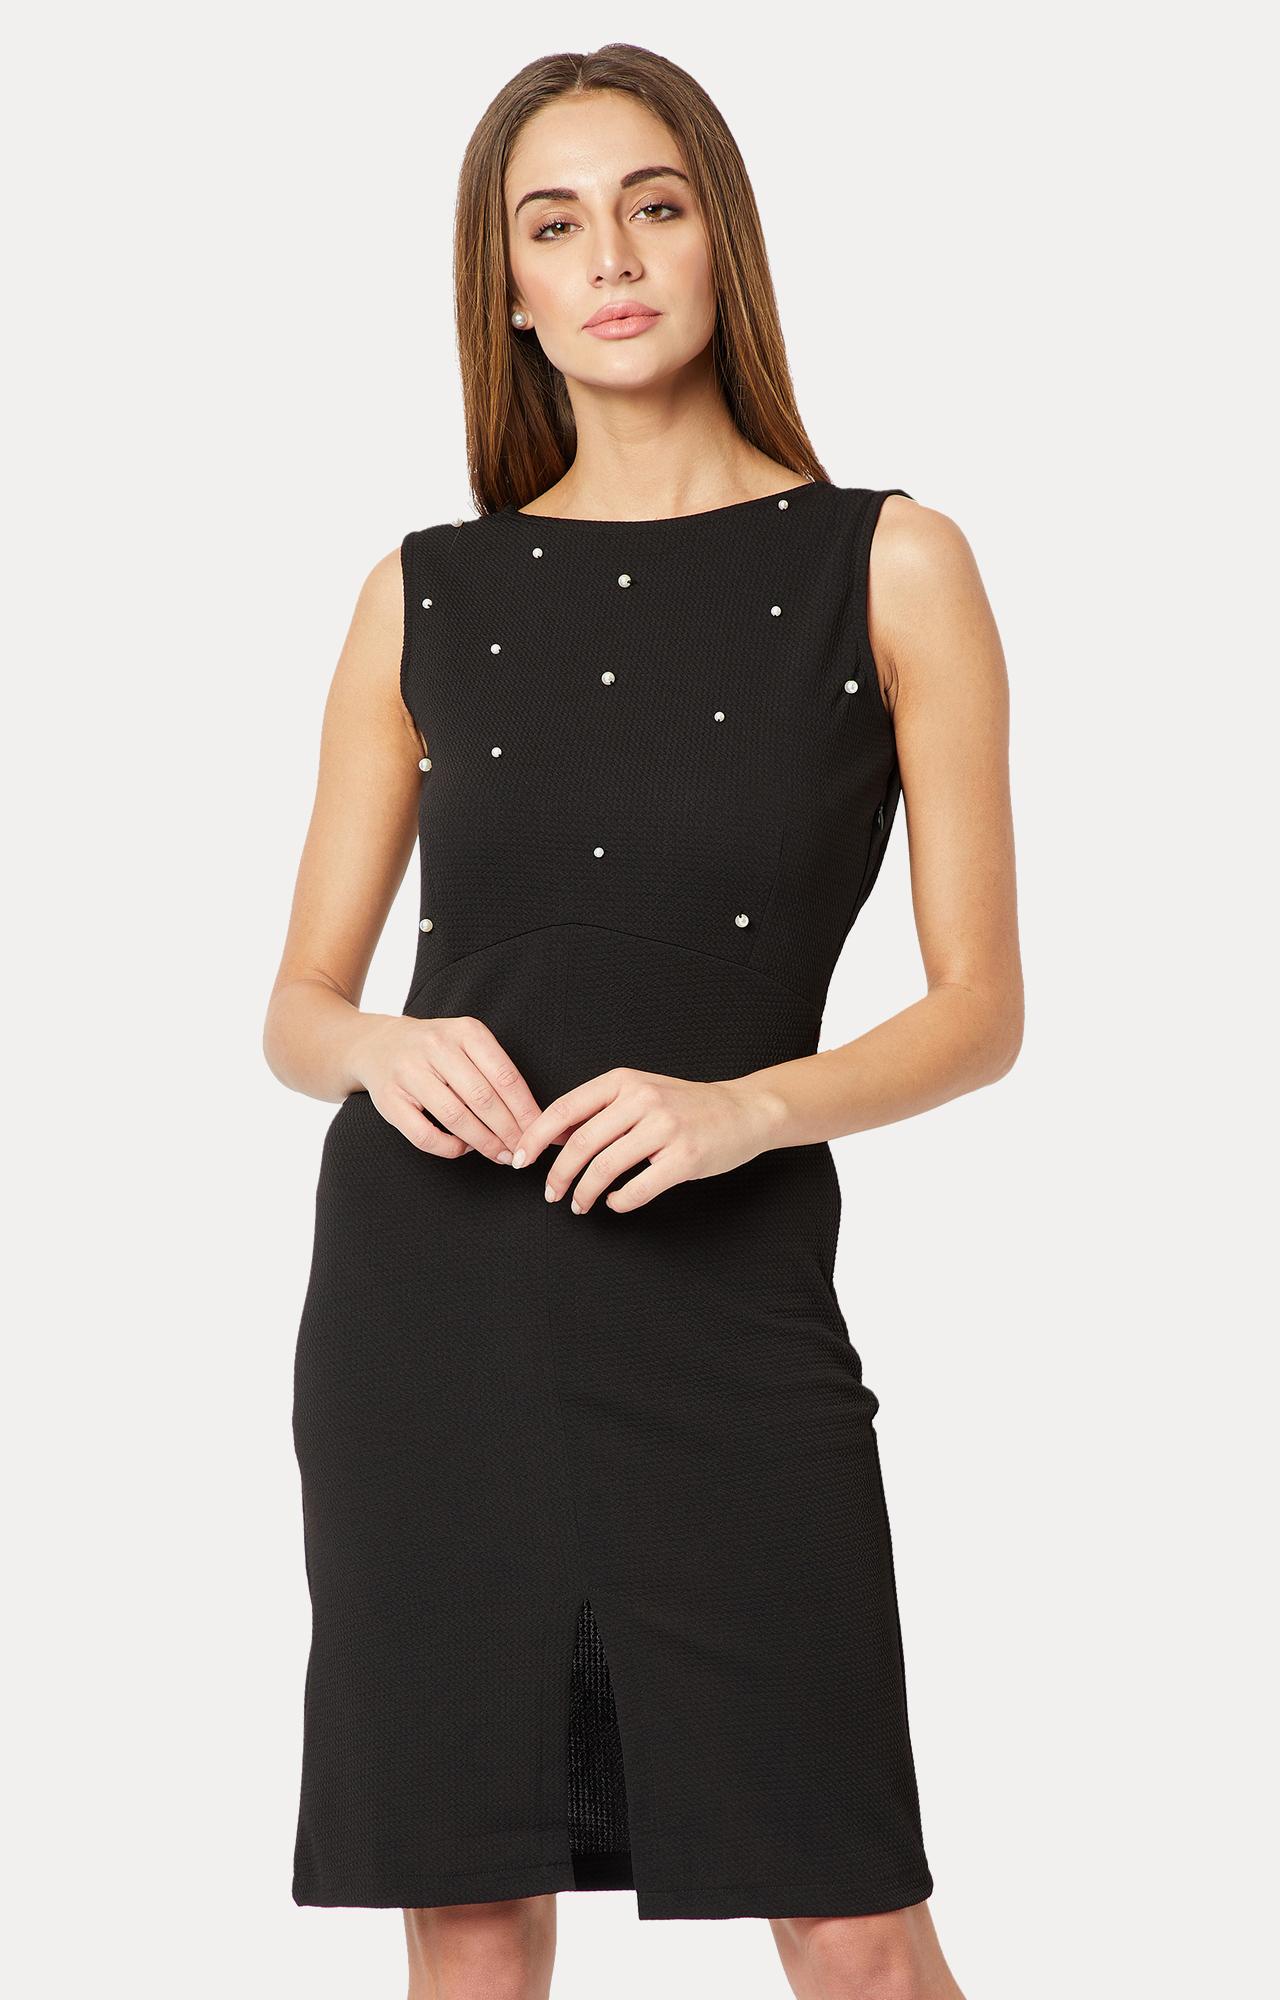 MISS CHASE | Black Solid Front Slit Pearl Detailing Shift Dress